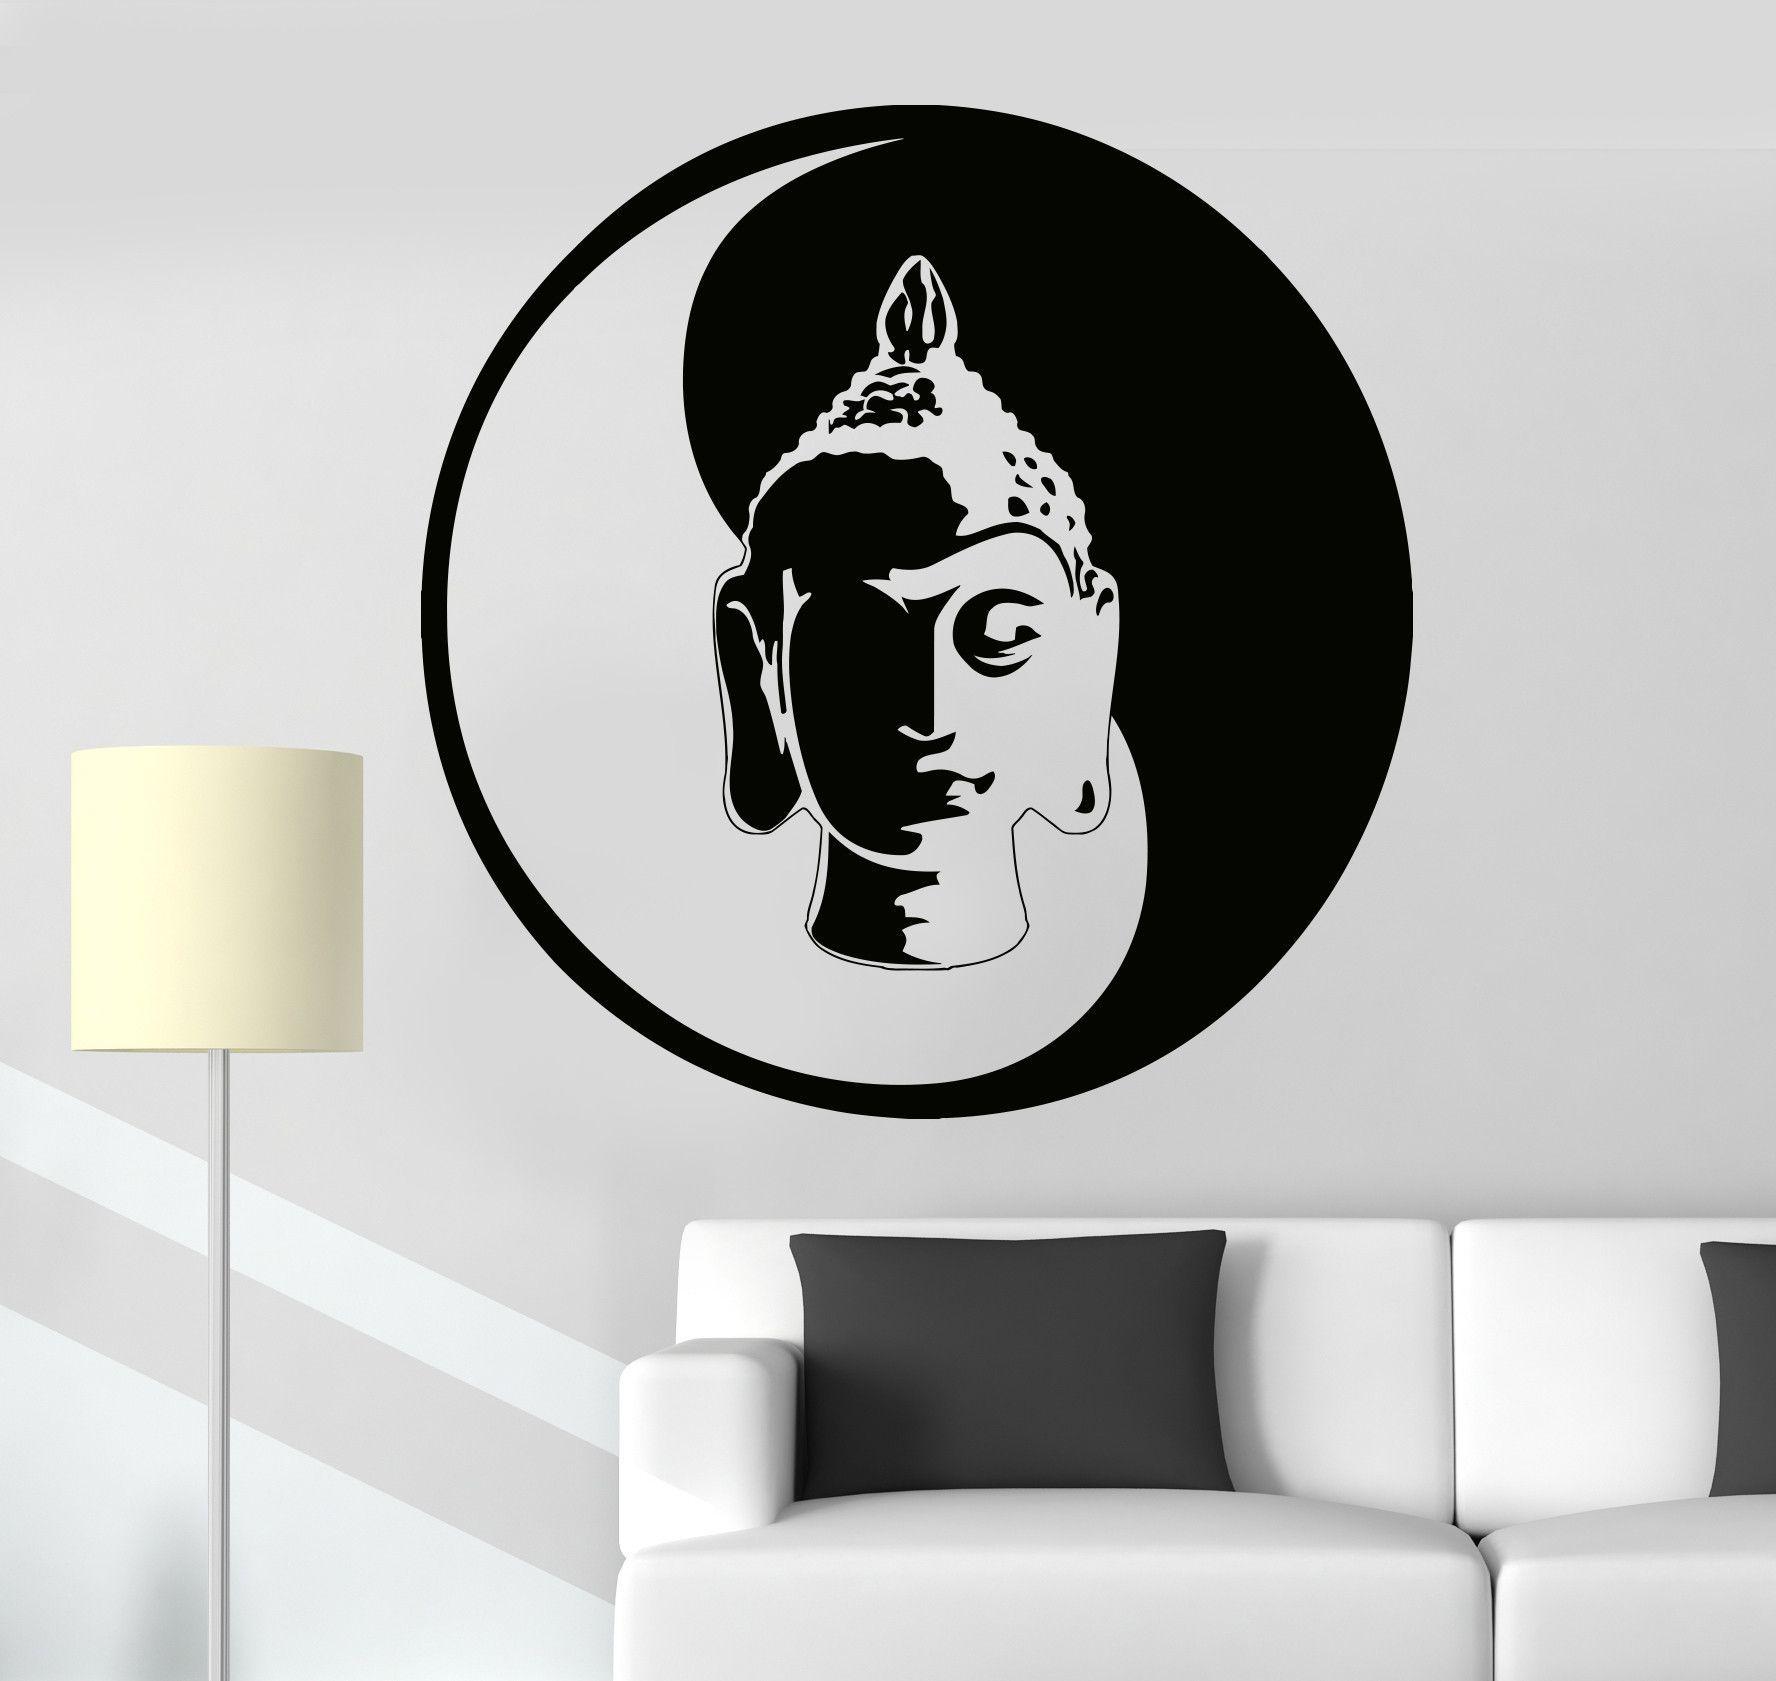 Vinyl Wall Decal Buddha Meditation Yin Yang Zen Buddhism Tao - Zen wall decalsvinyl wall decal yin yang yoga zen meditation bedroom decor